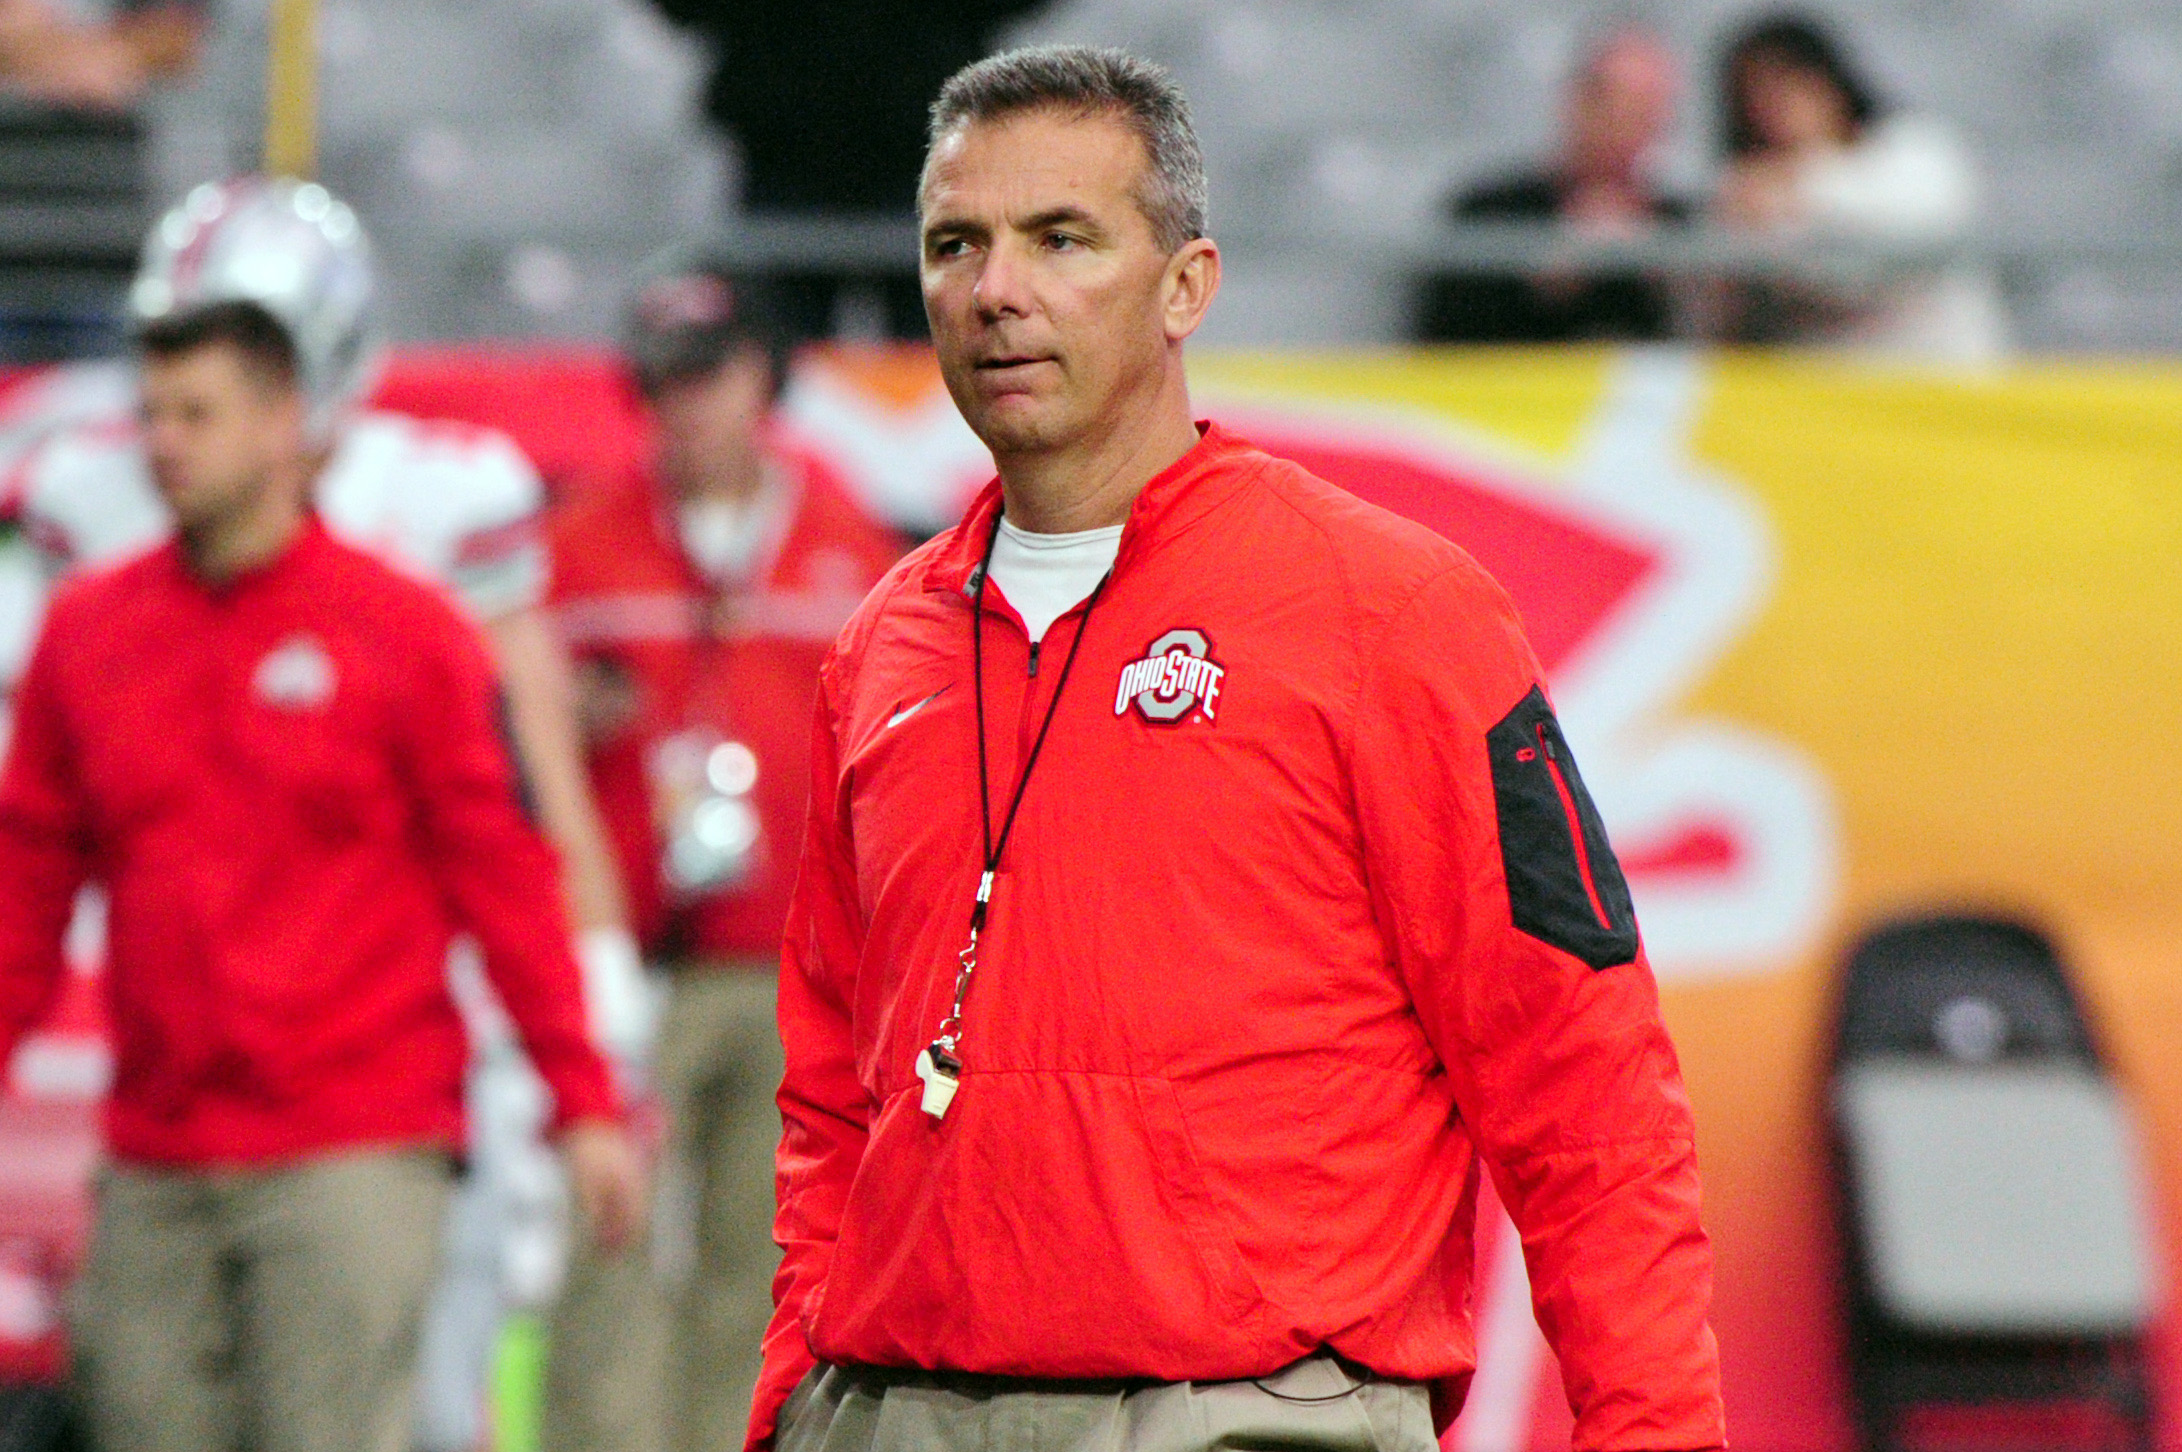 Ohio State Buckeyes head coach Urban Meye. Photo: Matt Kartozian-USA TODAY Sports